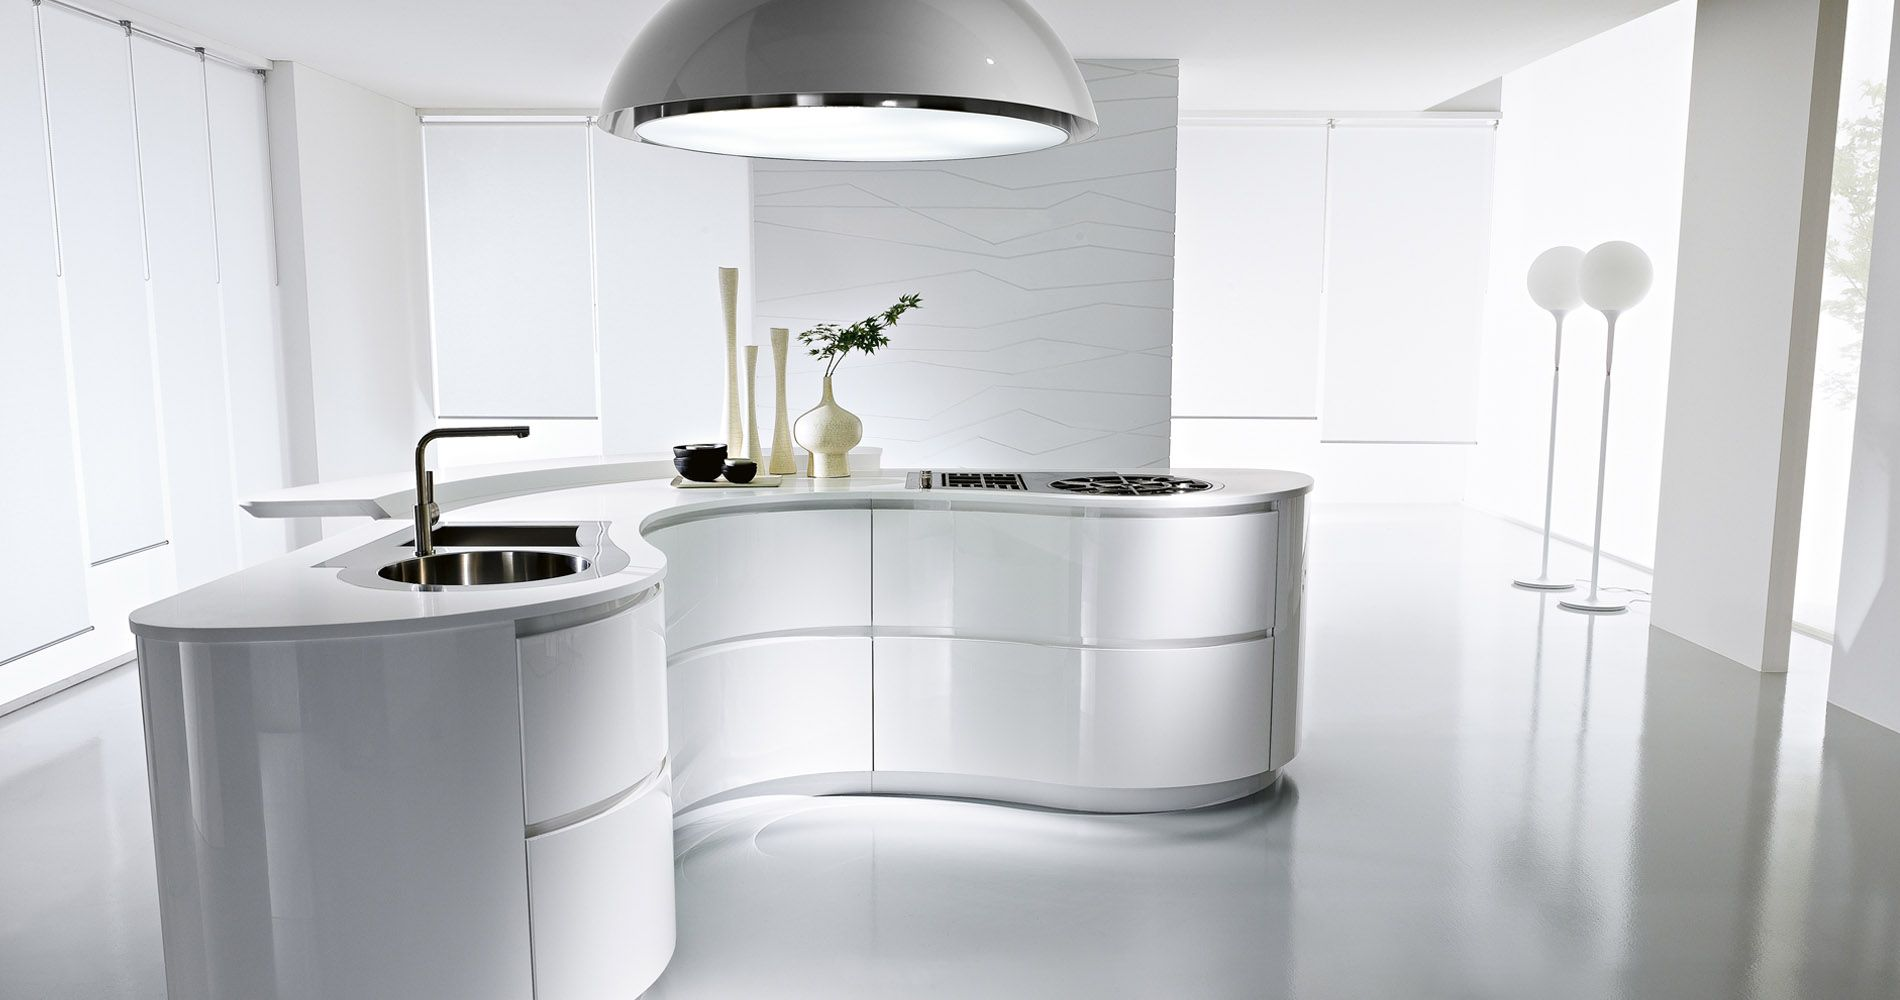 Pedini Kitchen Design Italian German European Modern Kitchens Contemporary Kitchen Cabin Curved Kitchen Contemporary Kitchen Design Italian Kitchen Design